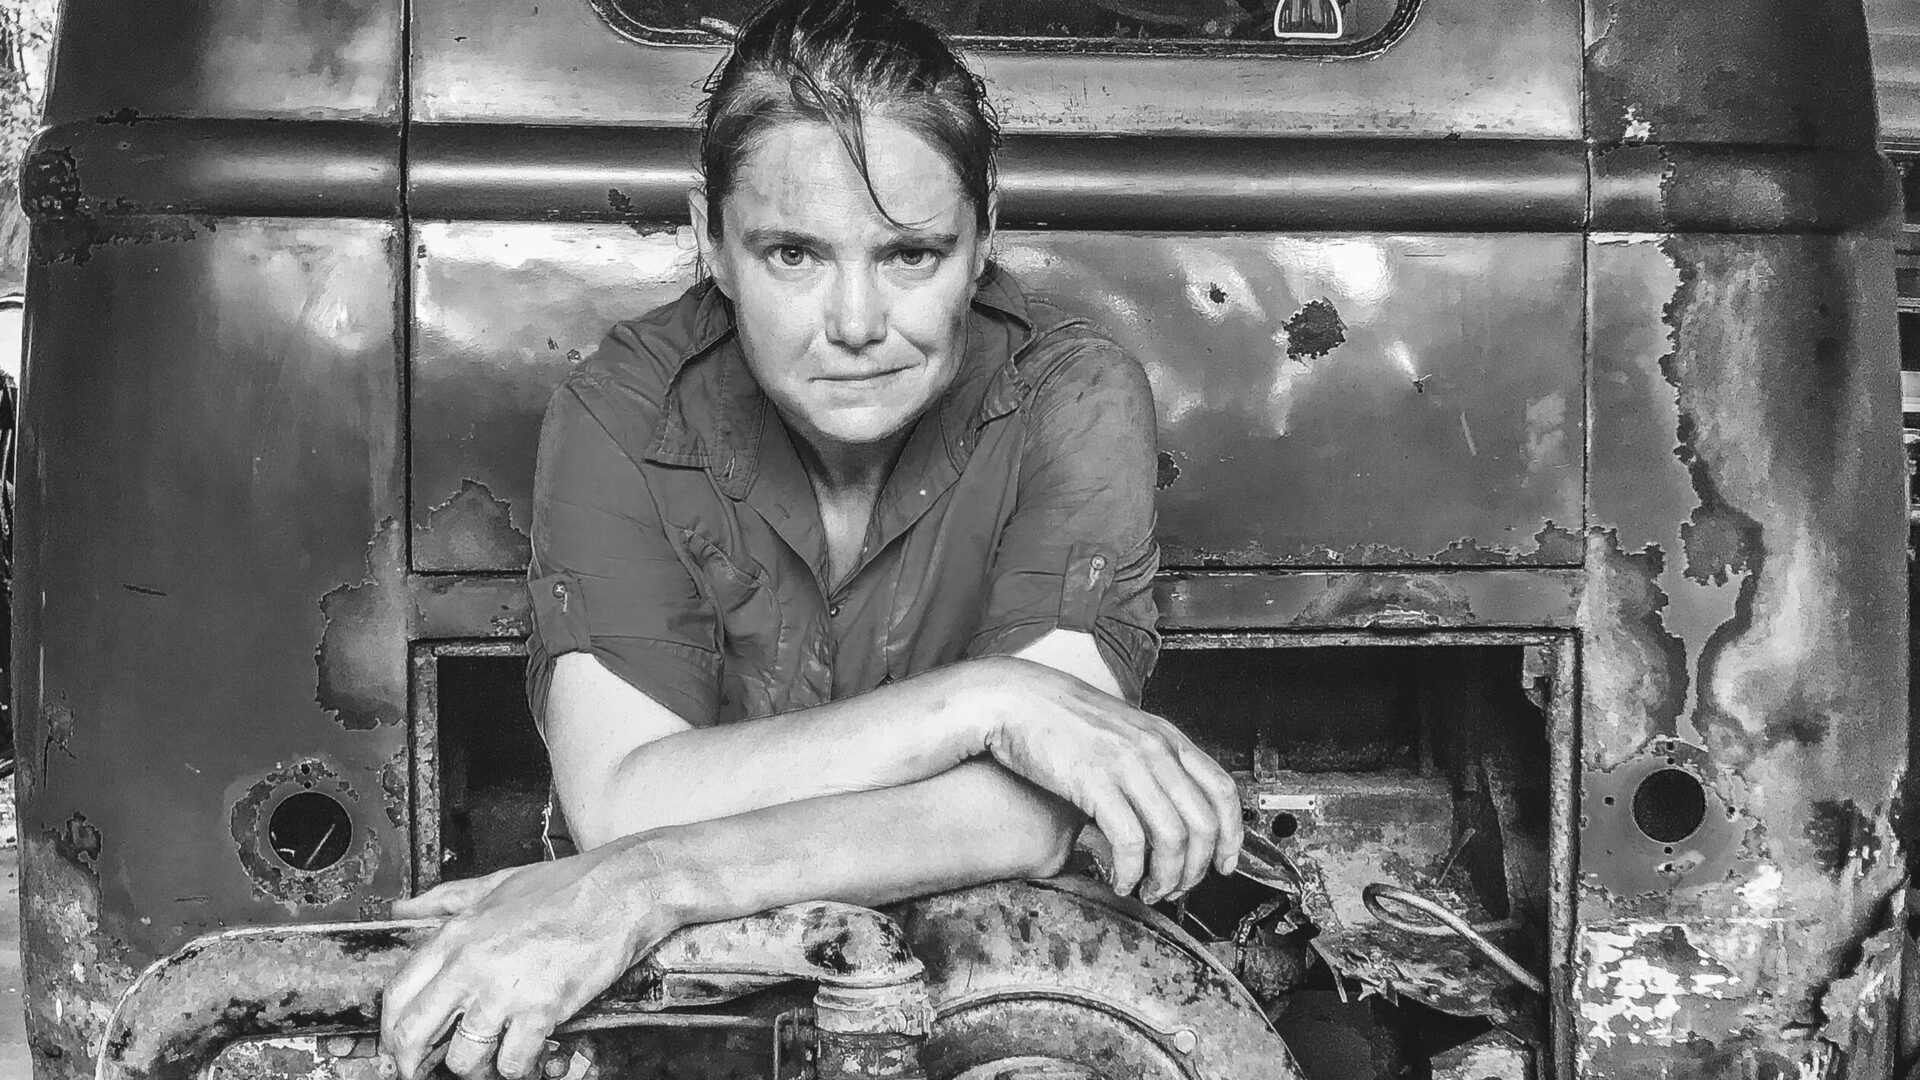 Salvaged - Junk In This Truck - Marci Wease - Metal Artist